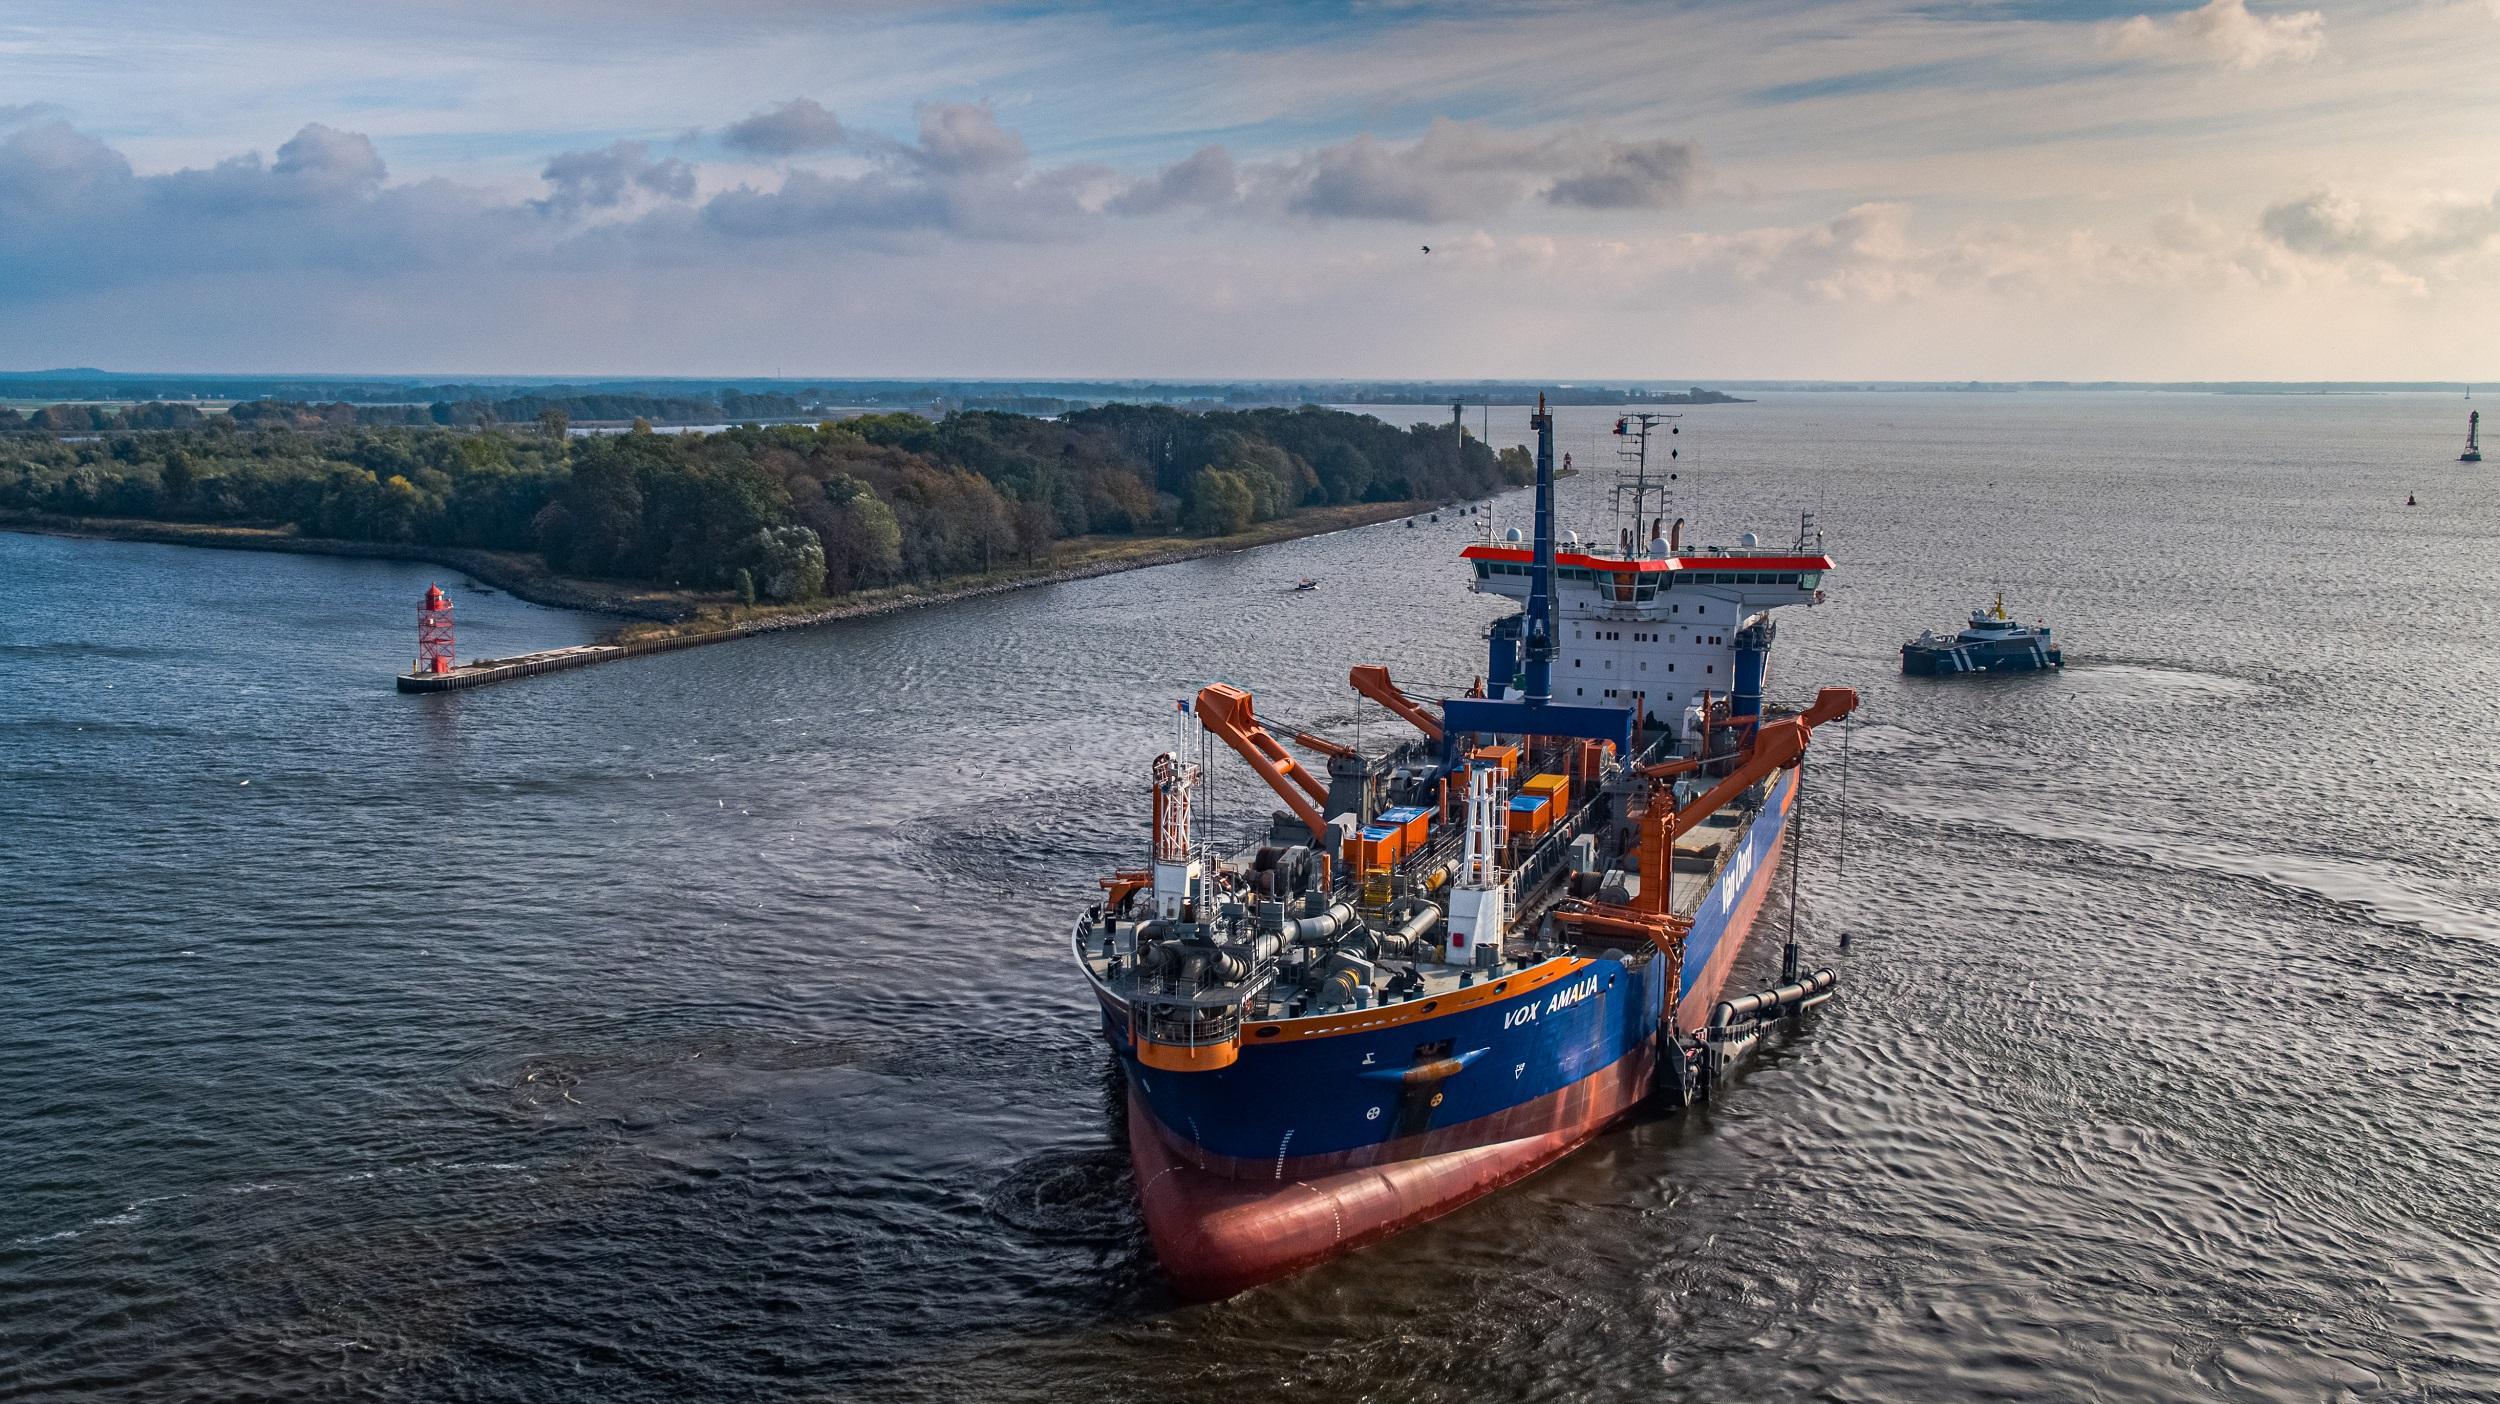 Van Oord: dredging under pressure, strong performance in offshore wind